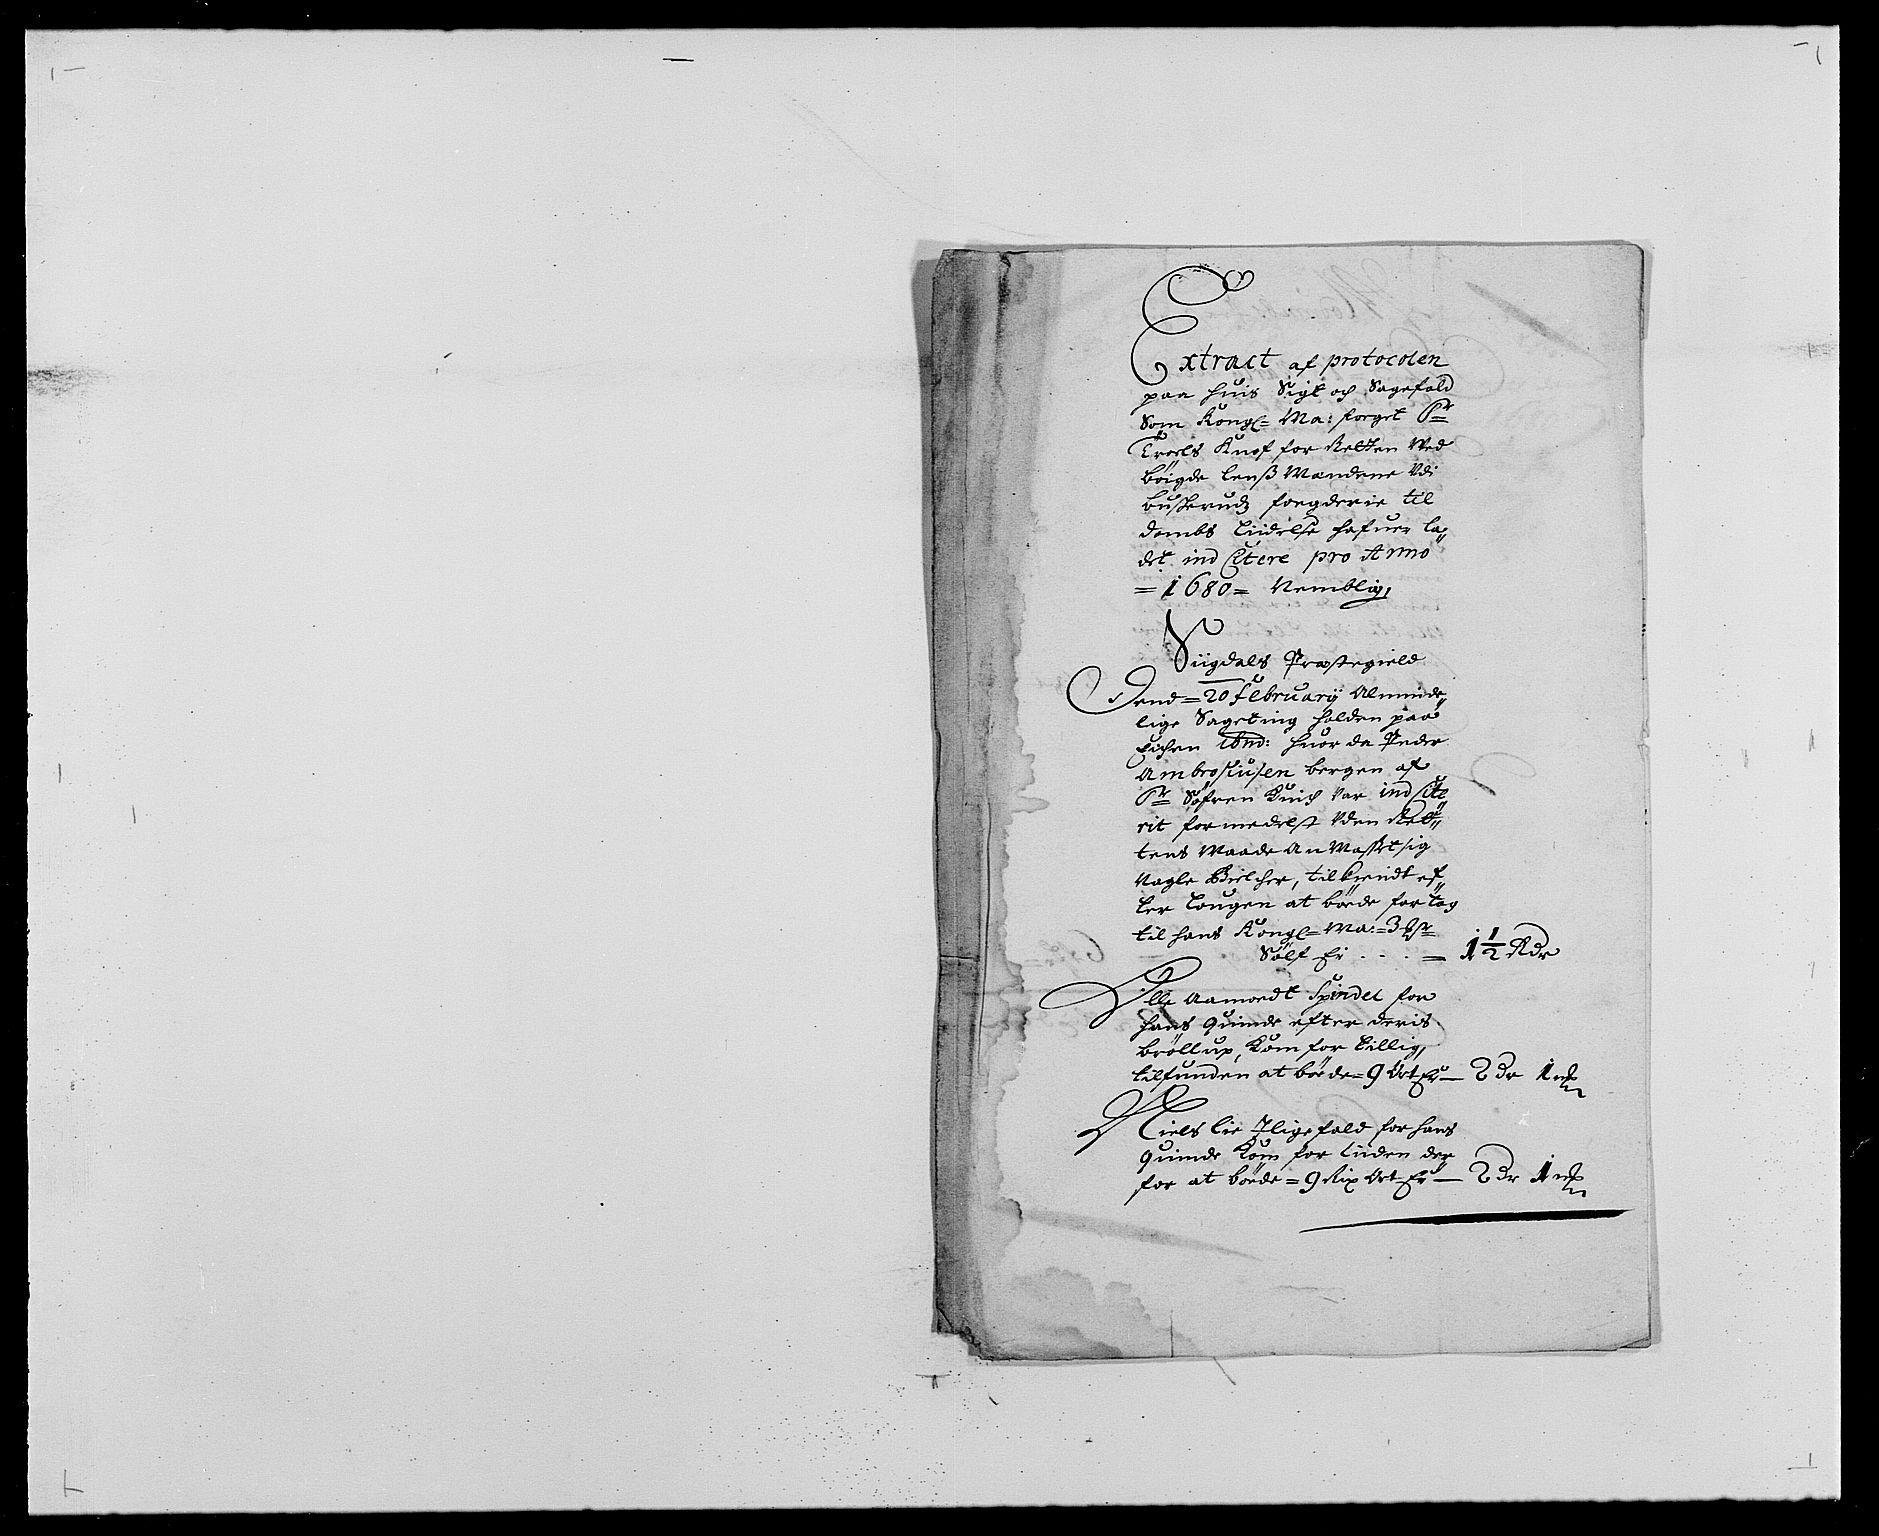 RA, Rentekammeret inntil 1814, Reviderte regnskaper, Fogderegnskap, R25/L1675: Fogderegnskap Buskerud, 1678-1681, s. 35